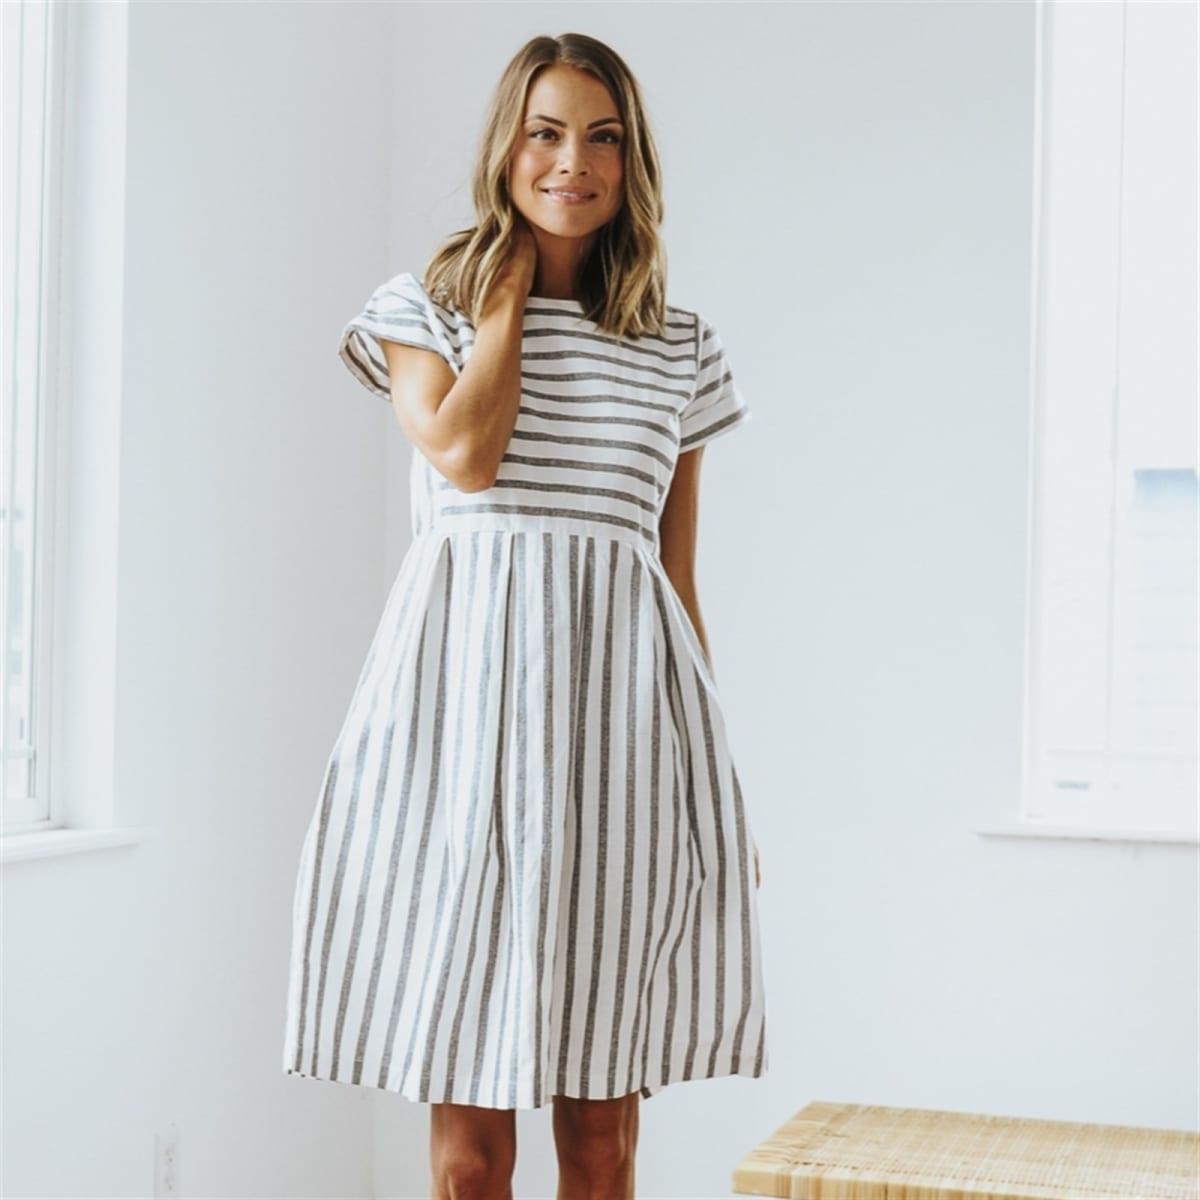 bfa1ecff3c Chambray Stripe Dress | S-2XL | Free Shipping